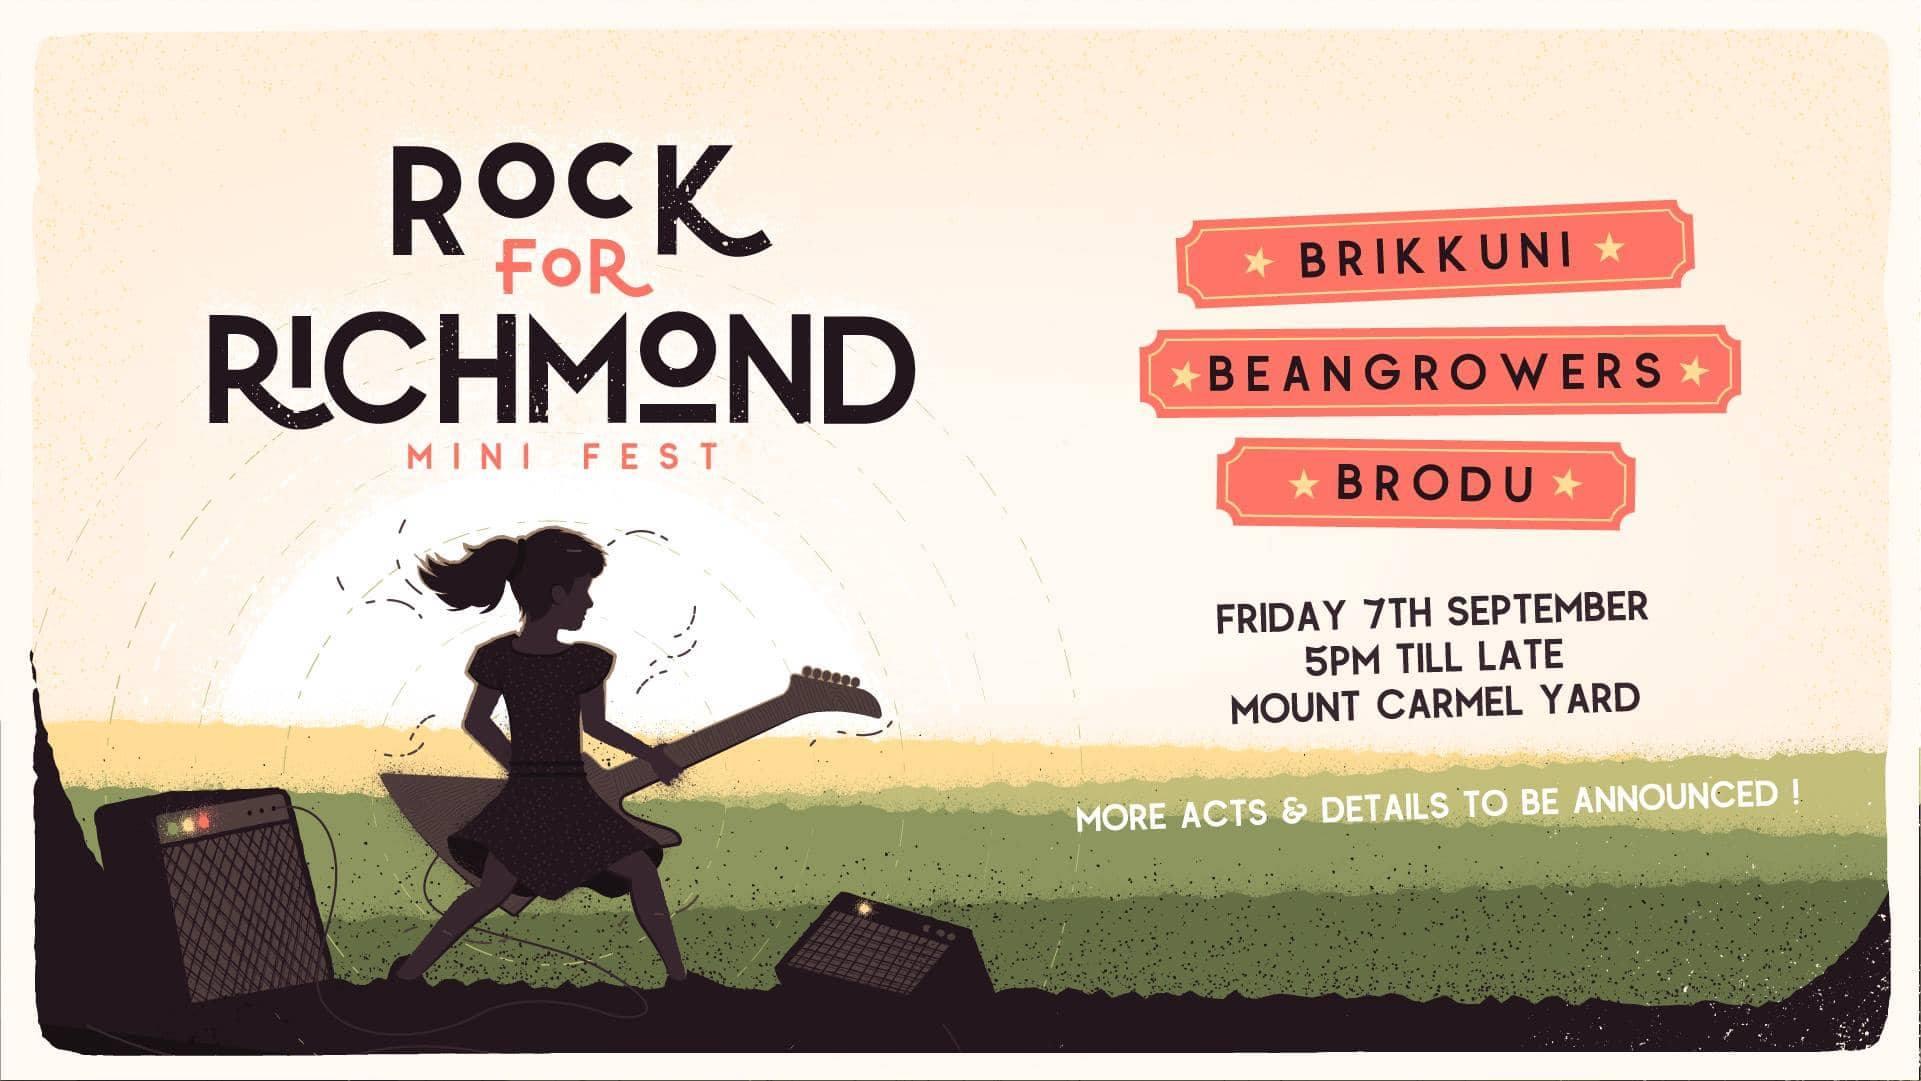 Richmond Foundation - MaltaRock for Richmond